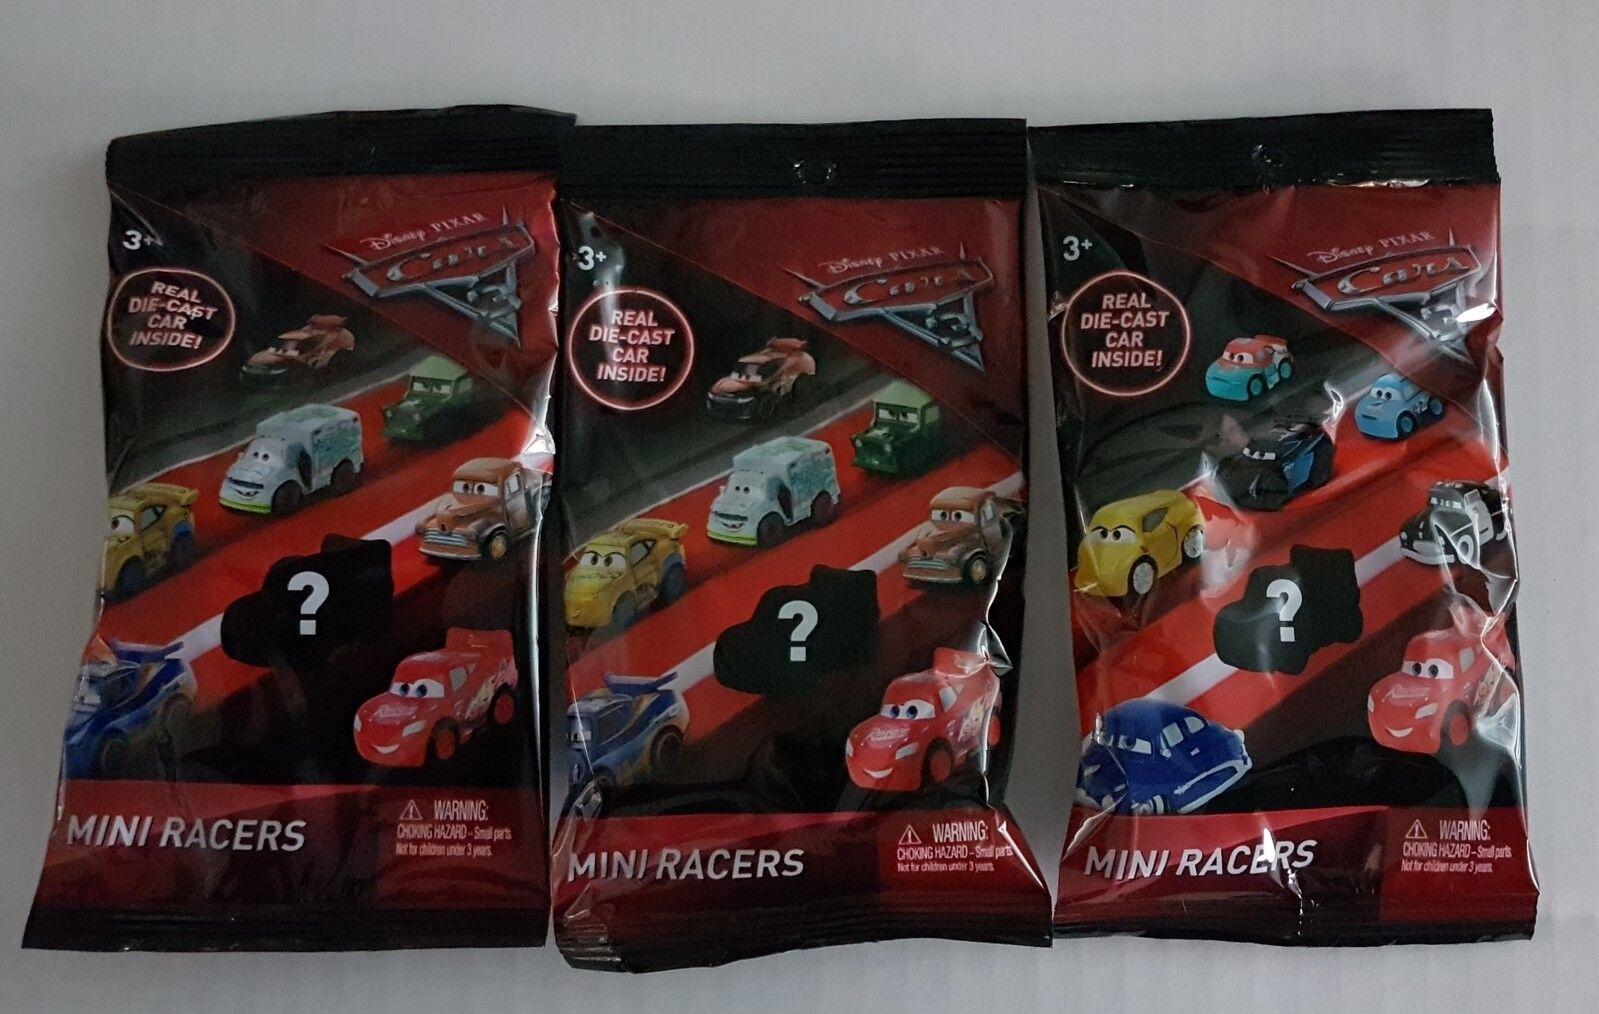 Mattel Disney Pixar Cars 3 MINI RACERS Die-Cast Cars - Near